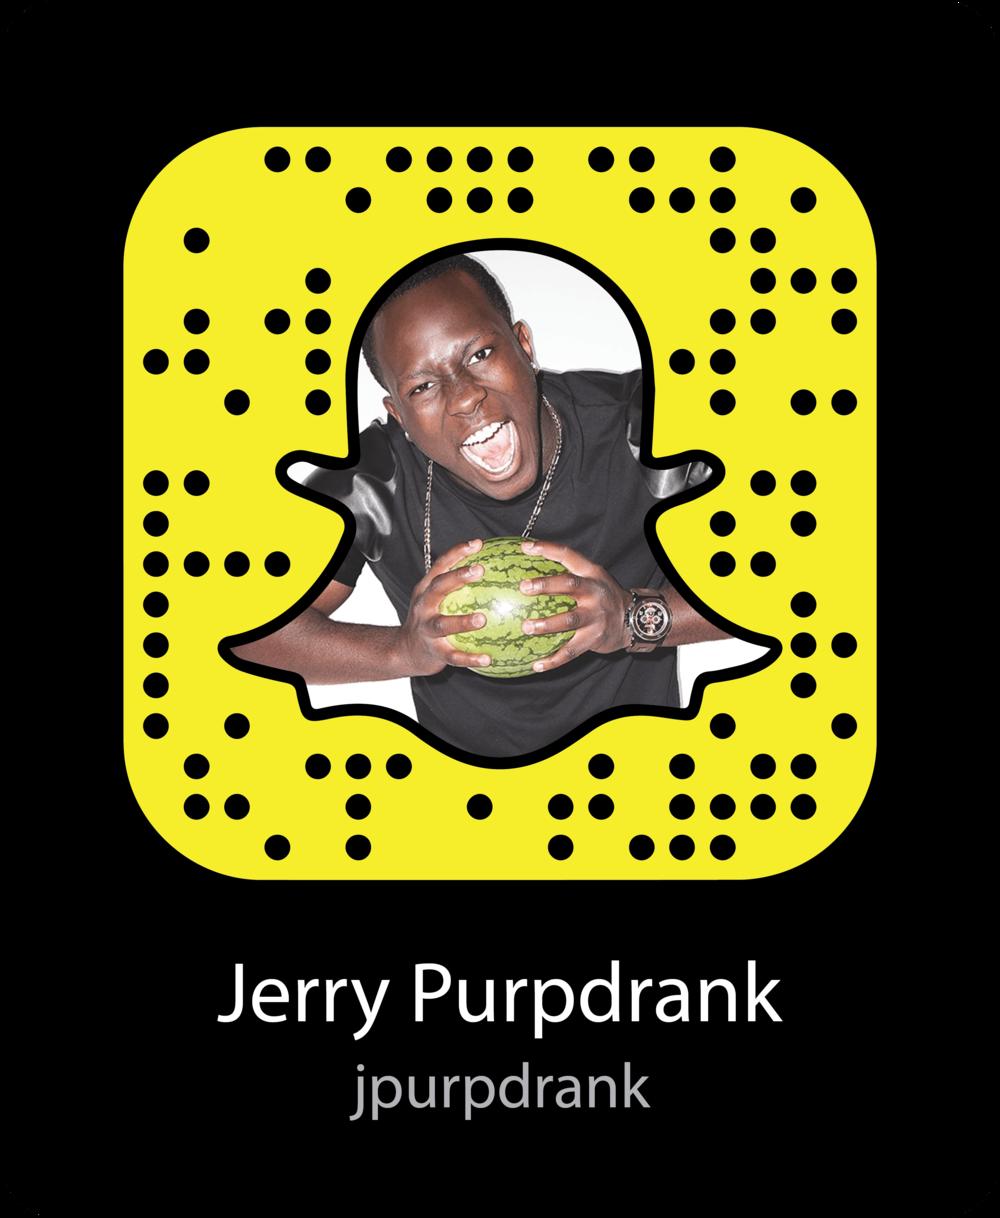 jerry-purpdrank-vine-celebrity-snapchat-snapcode